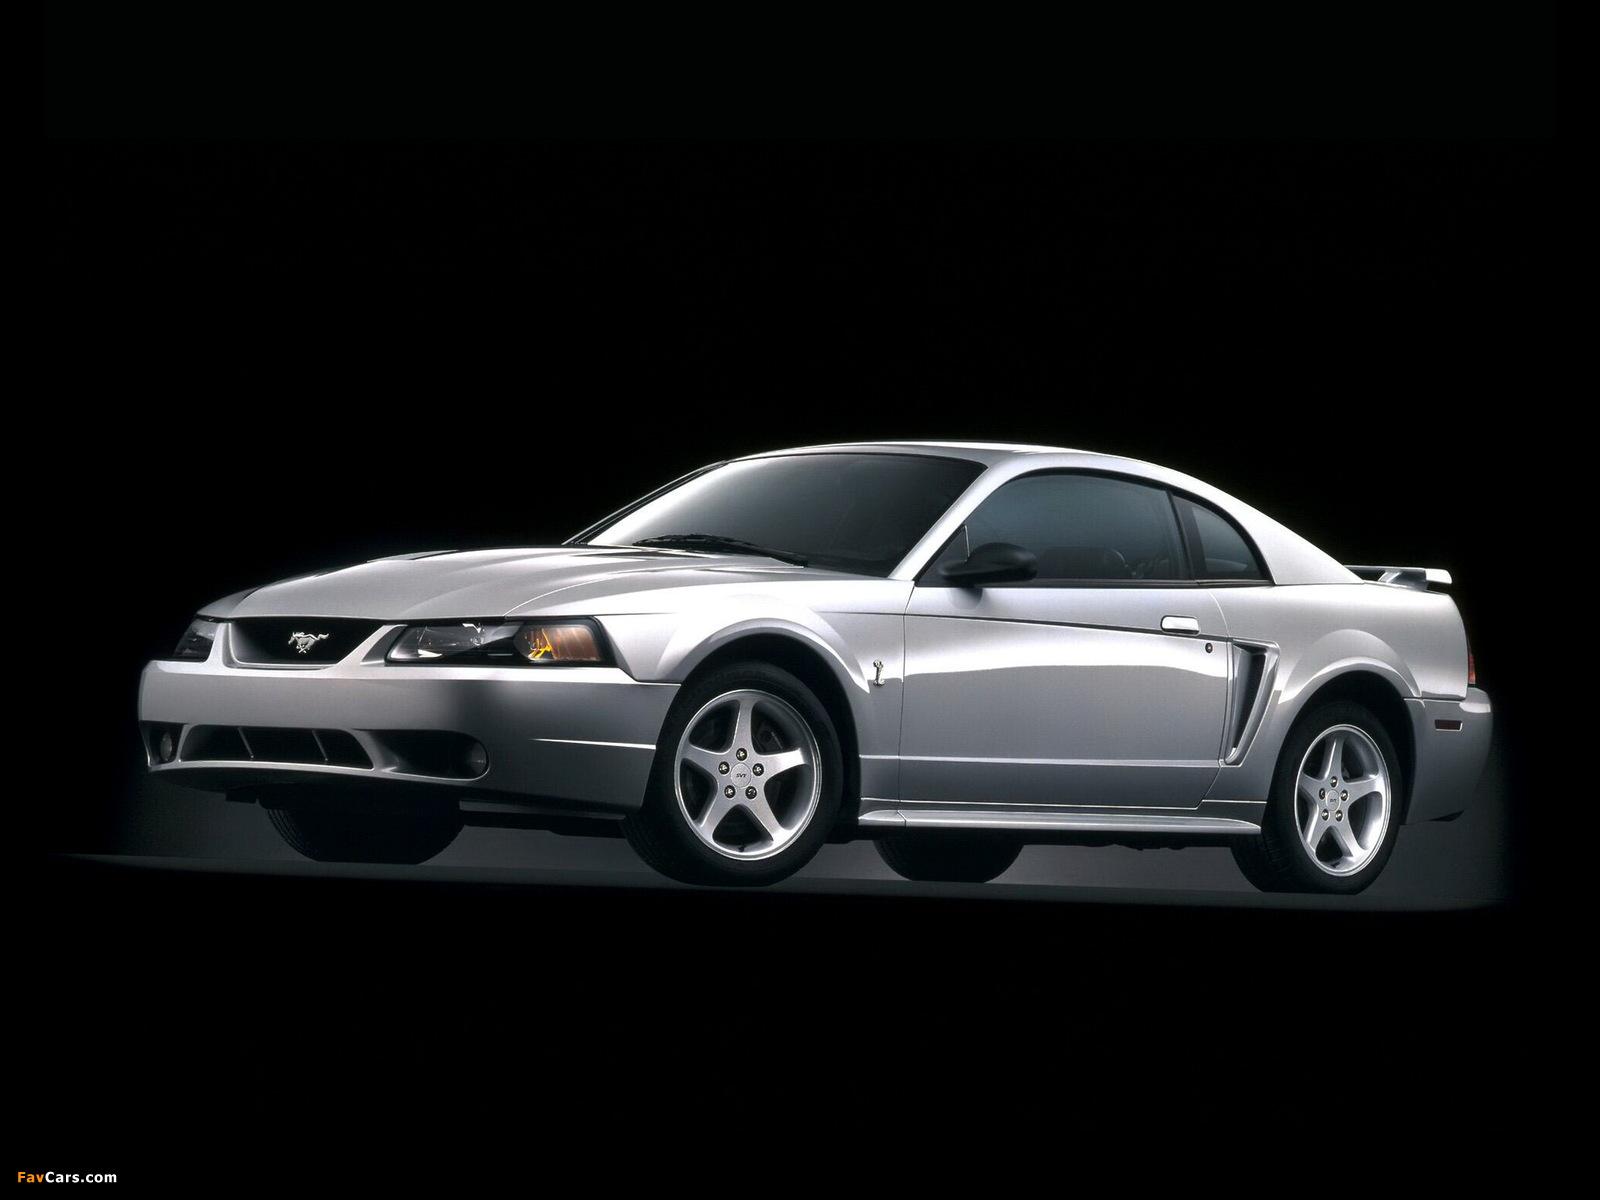 Mustang SVT Cobra Coupe 1999–2002 photos (1600 x 1200)